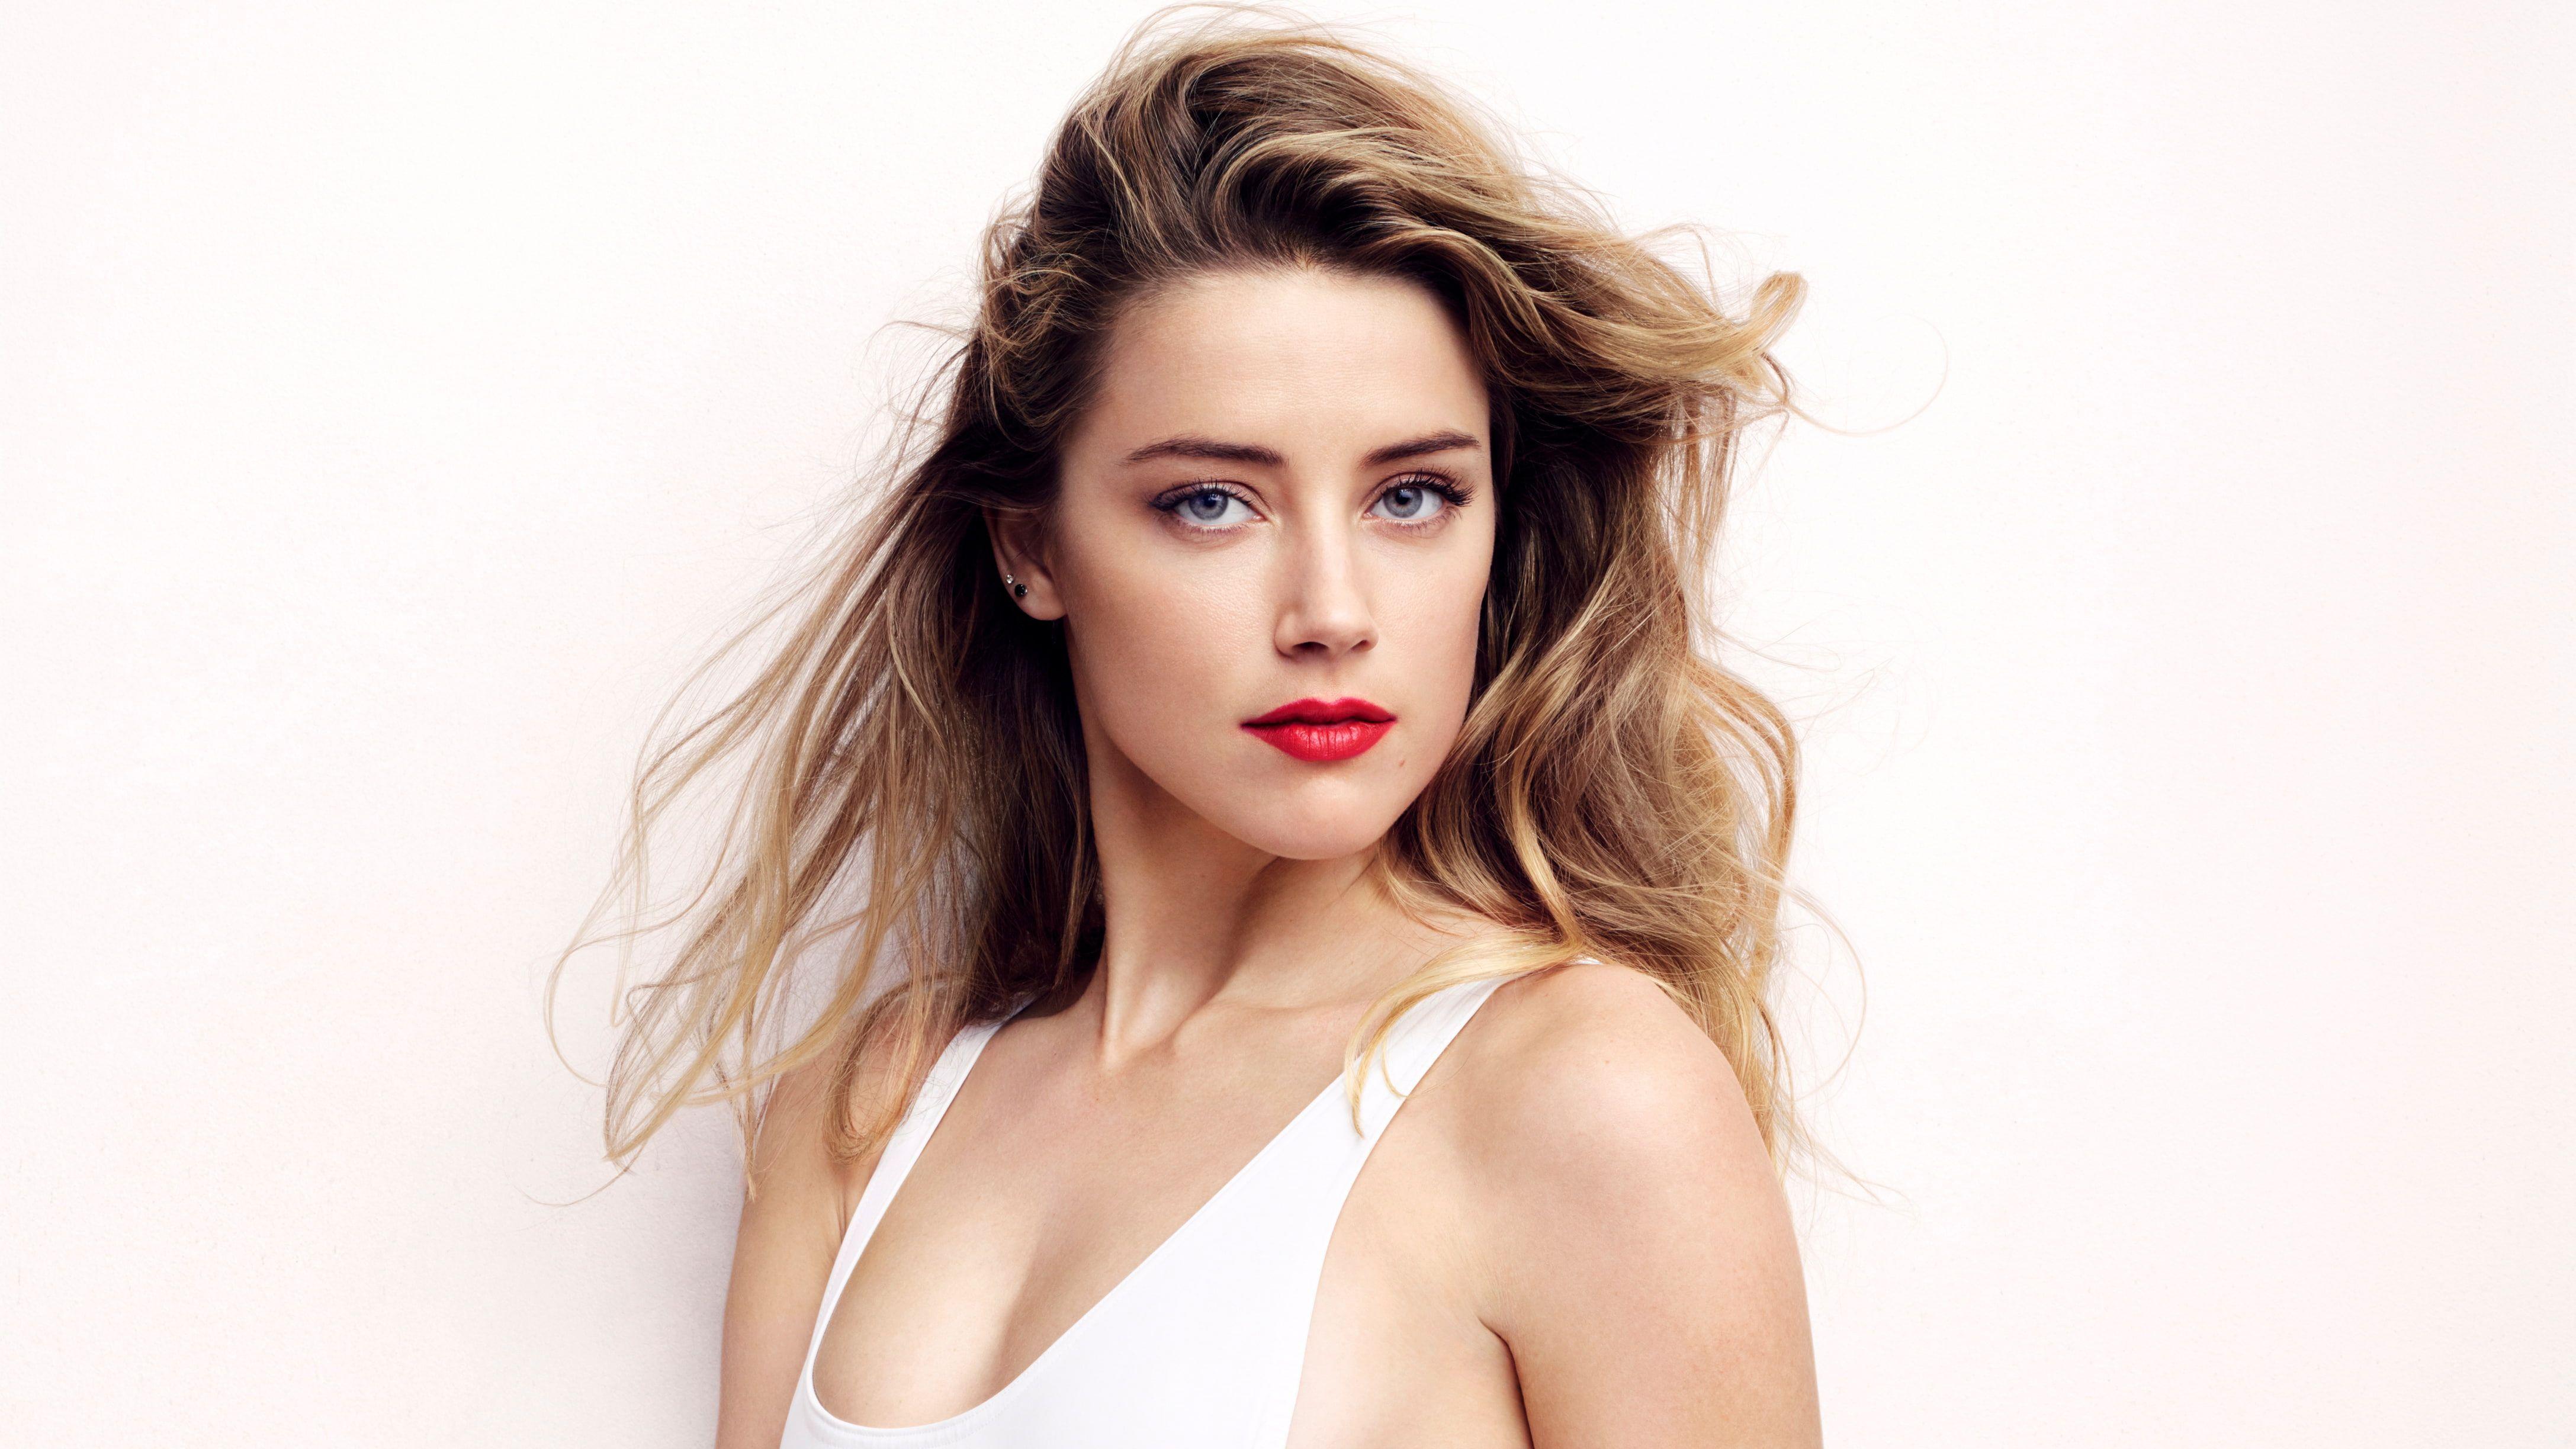 Amber Heard 4k Amber Heard 4k Wallpaper Hdwallpaper Desktop Amber Heard Wallpaper Beauty Amber Heard